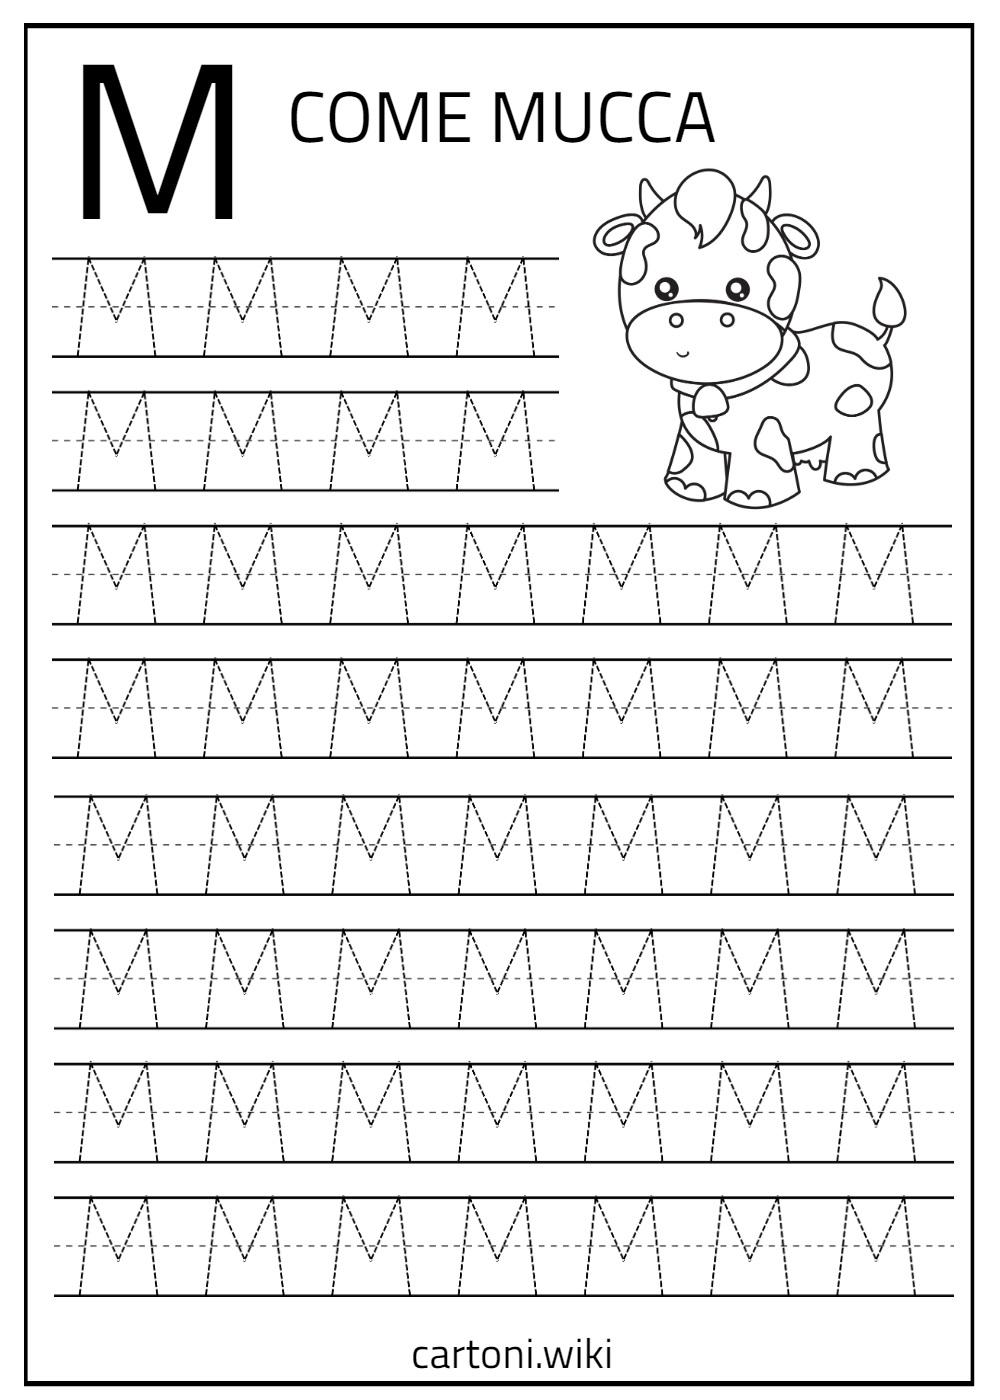 M stampatello - Cartoni animati